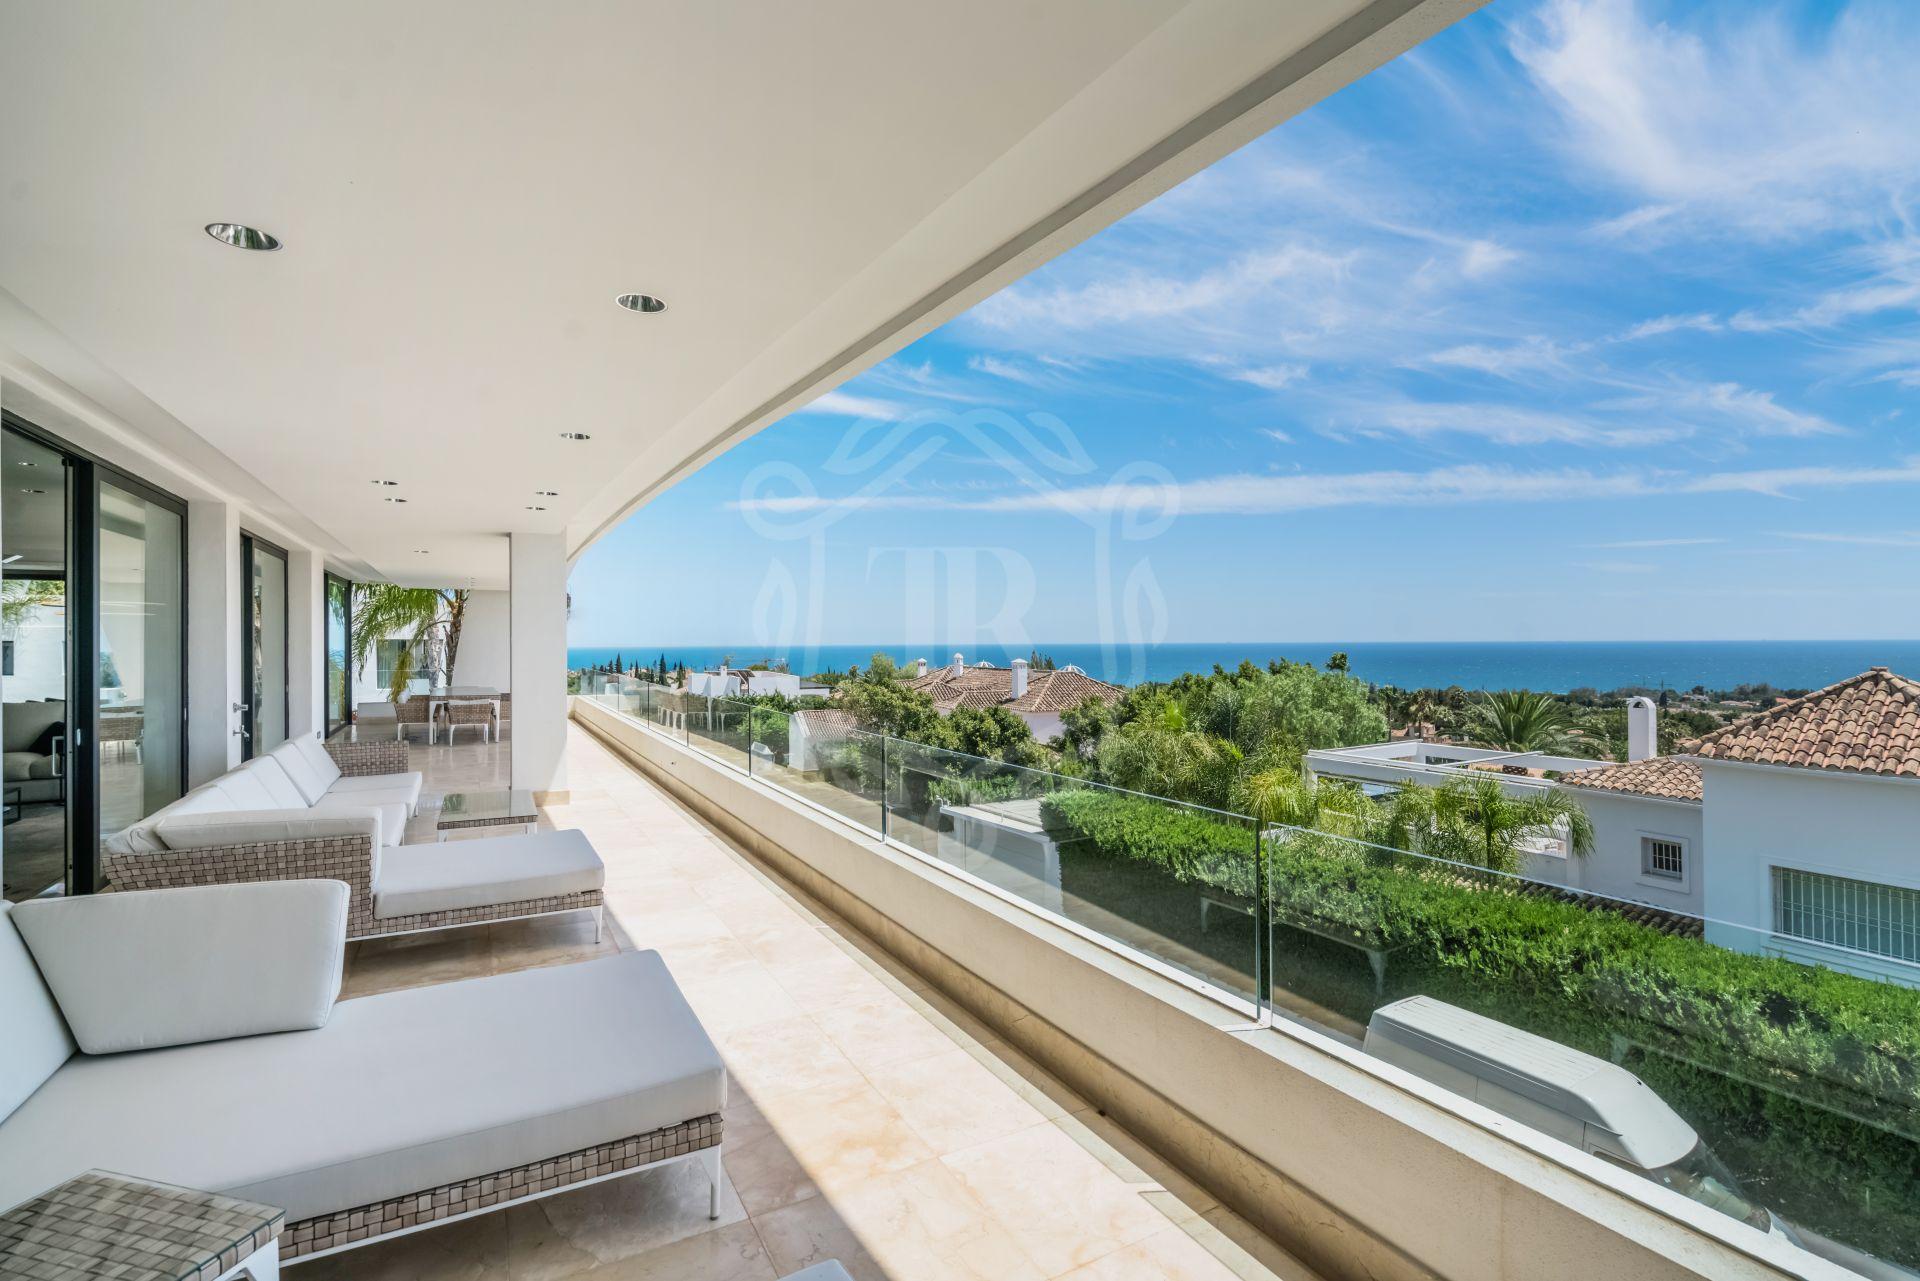 Duplex Penthouse for sale in Reserva de Sierra Blanca, Marbella Golden Mile